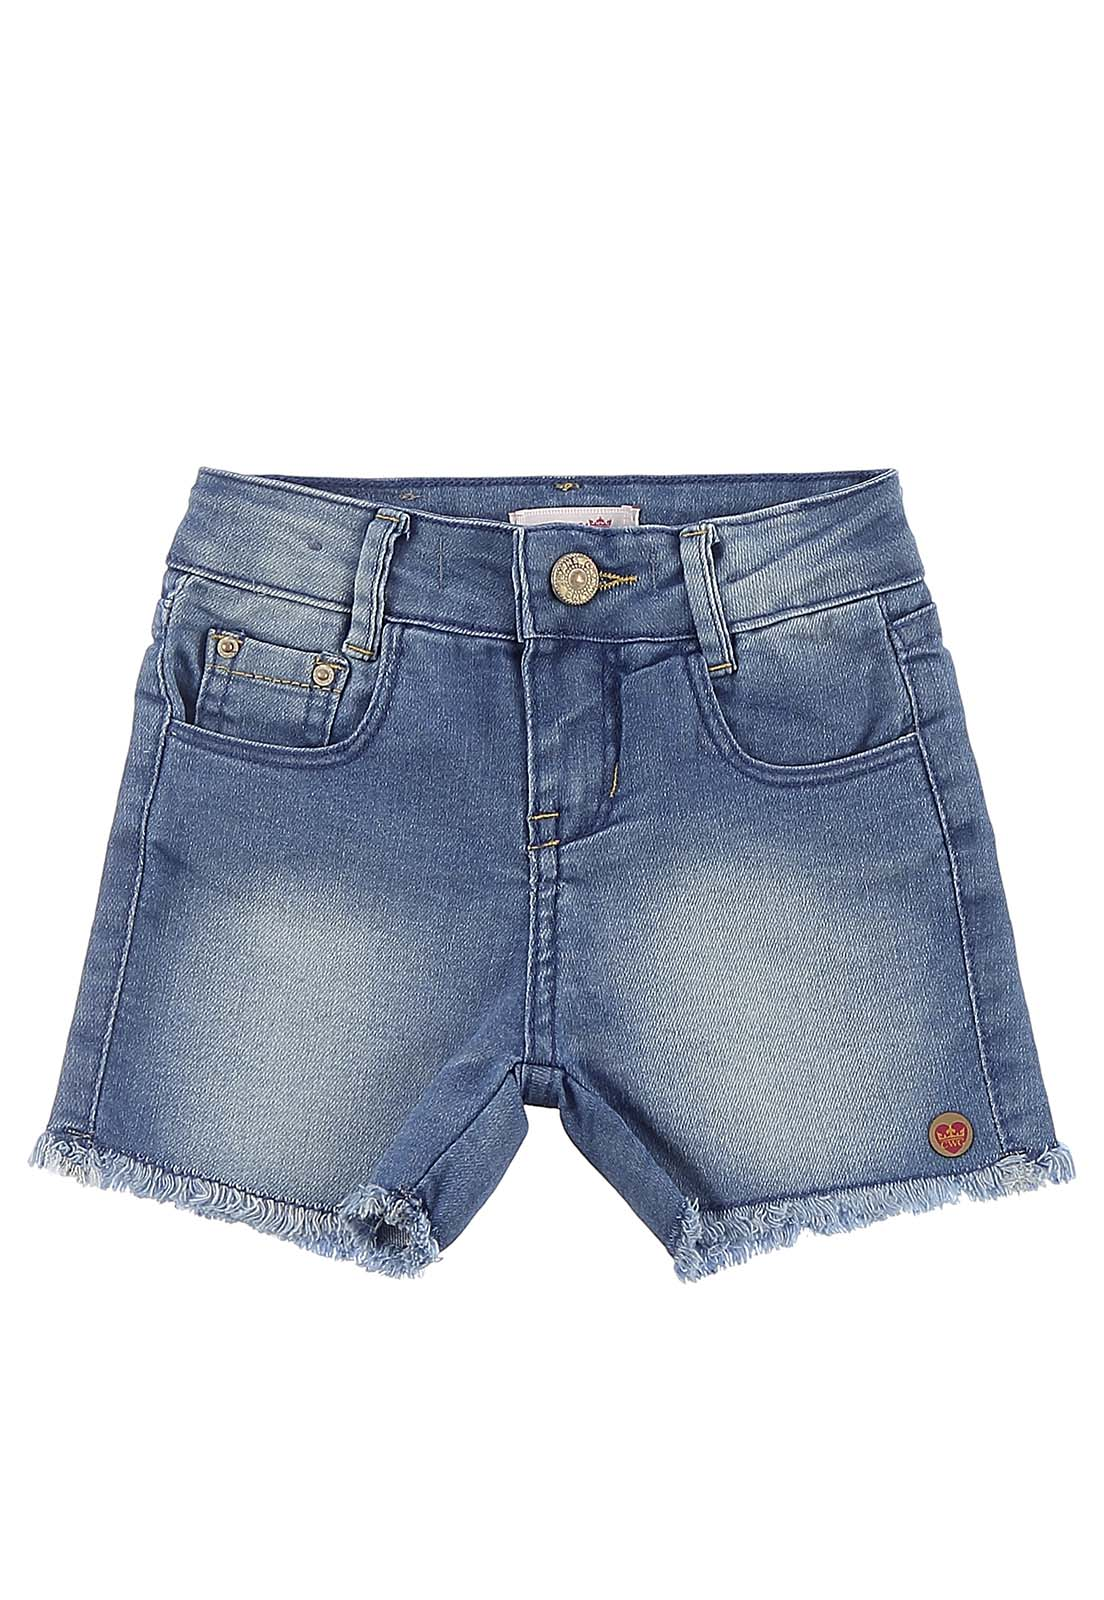 Short Feminino Crawling Jeans Baby Girl